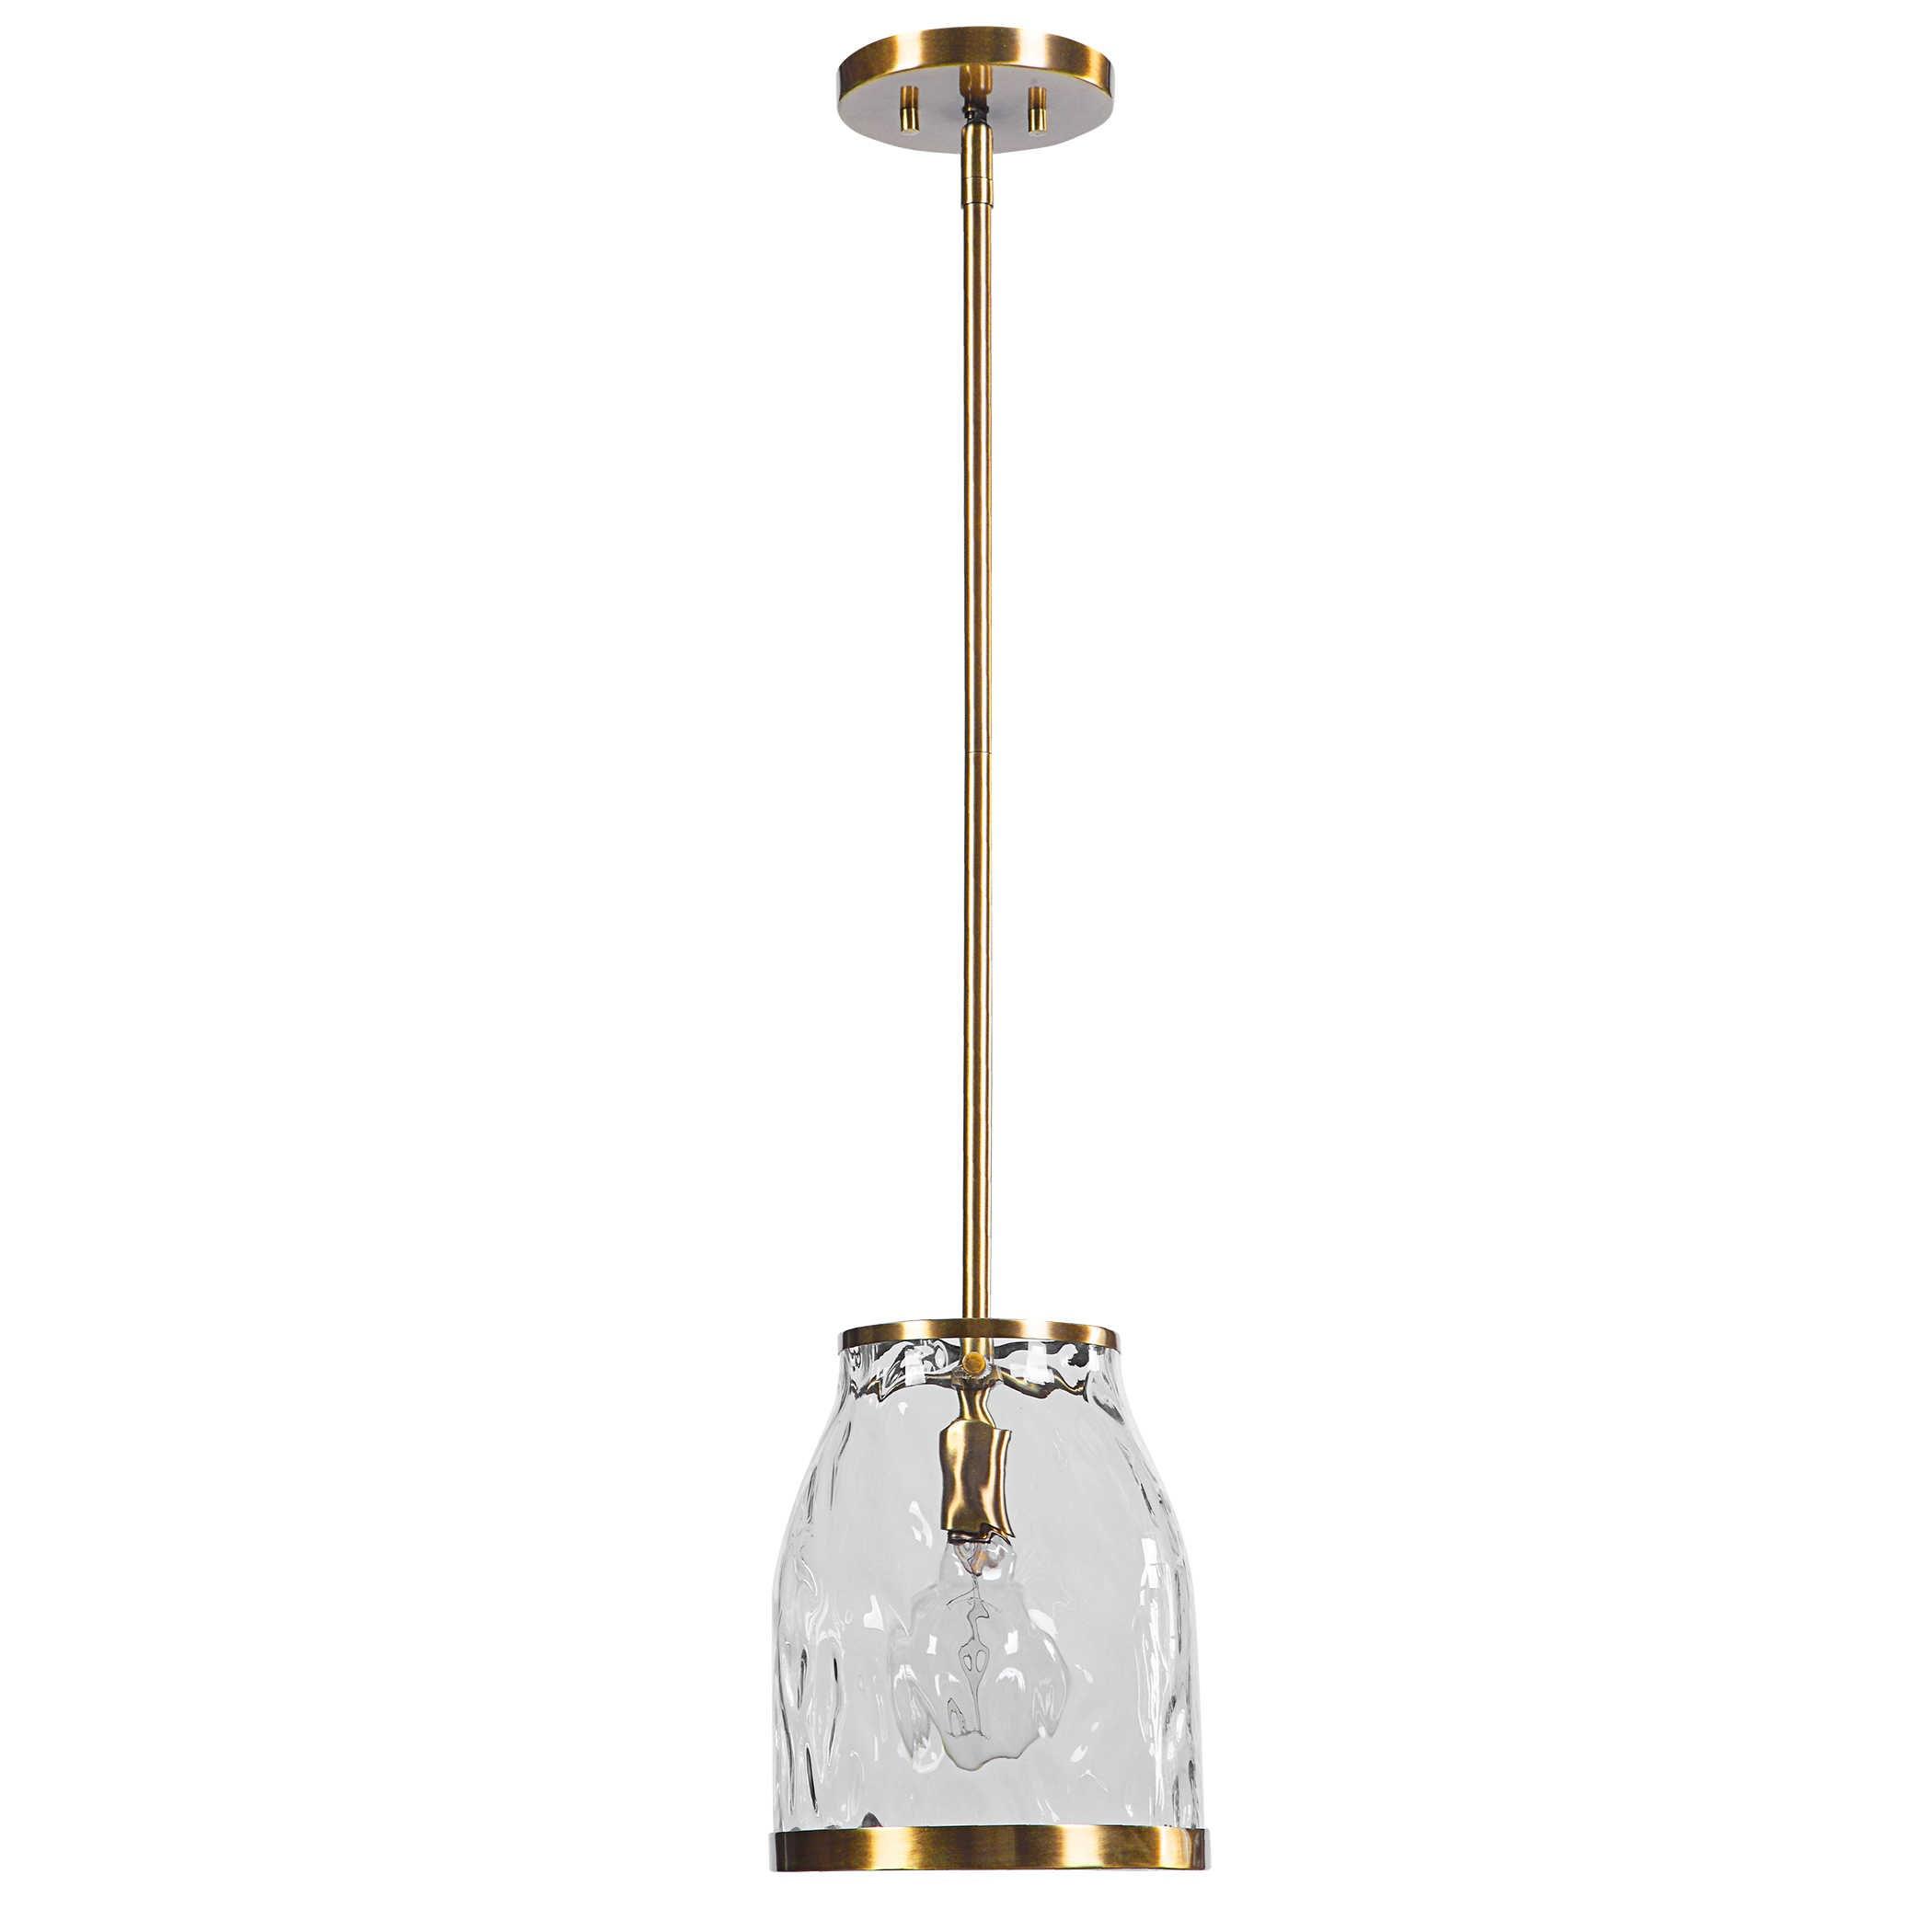 Lighting Fixtures - Pendant Lights Crossley 1 Light Glass Mini Pendant by Uttermost at Suburban Furniture